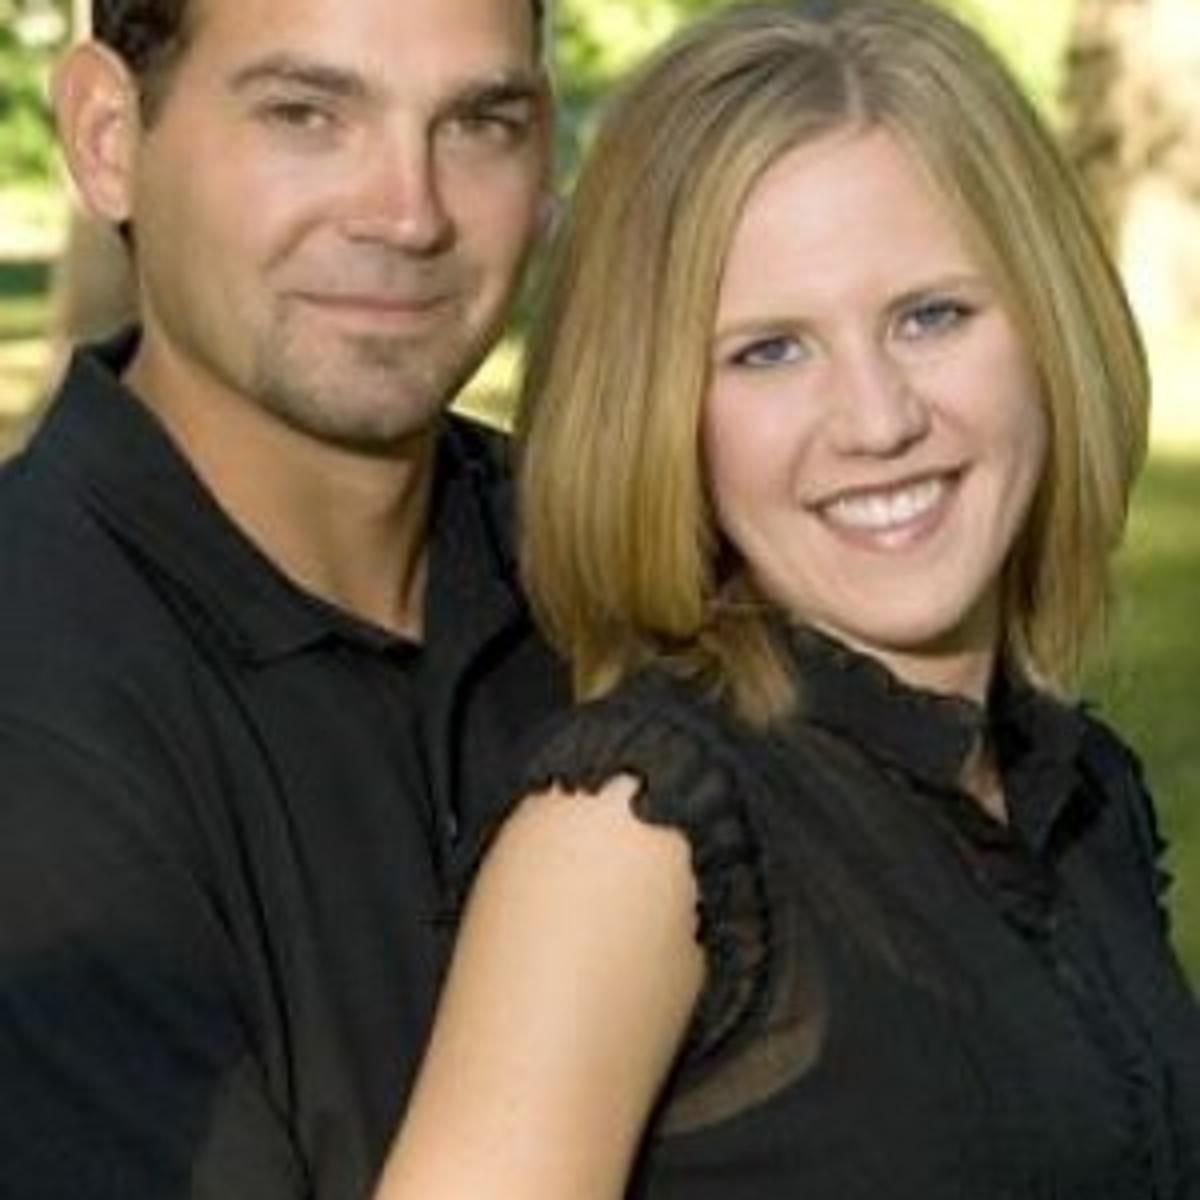 Chippewa falls dating logan miller and caitlyn taylor love dating